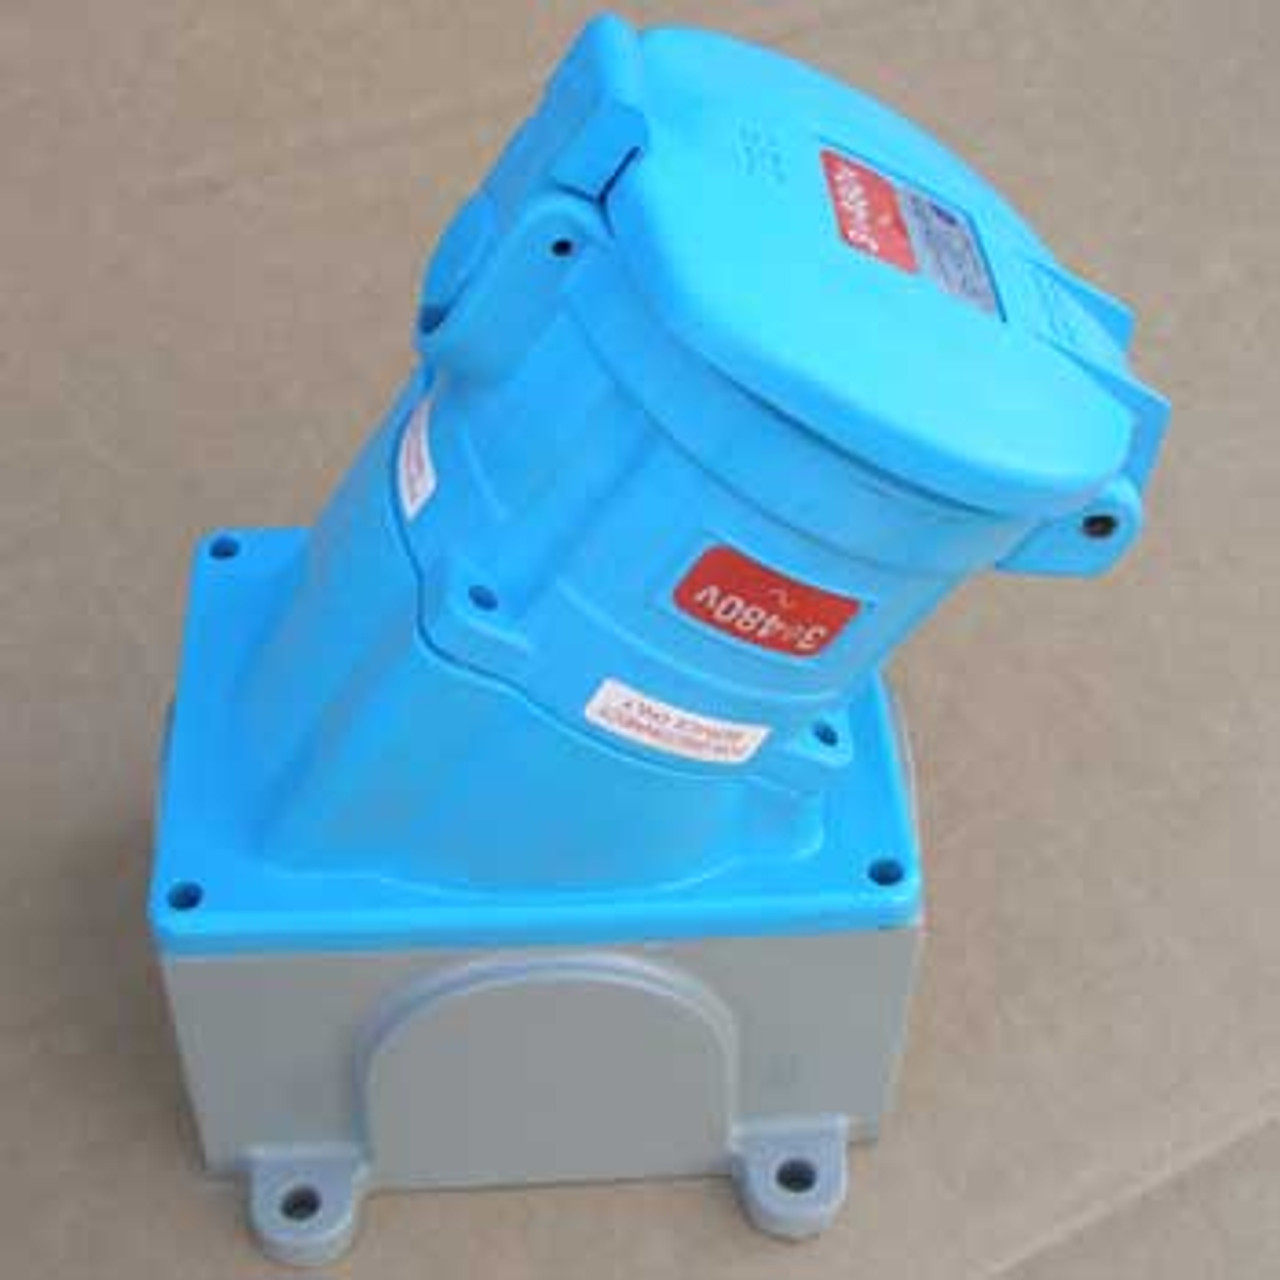 Meltric 31-60243-080 Receptacle/Angle Adapter/Metal Box 480V - New